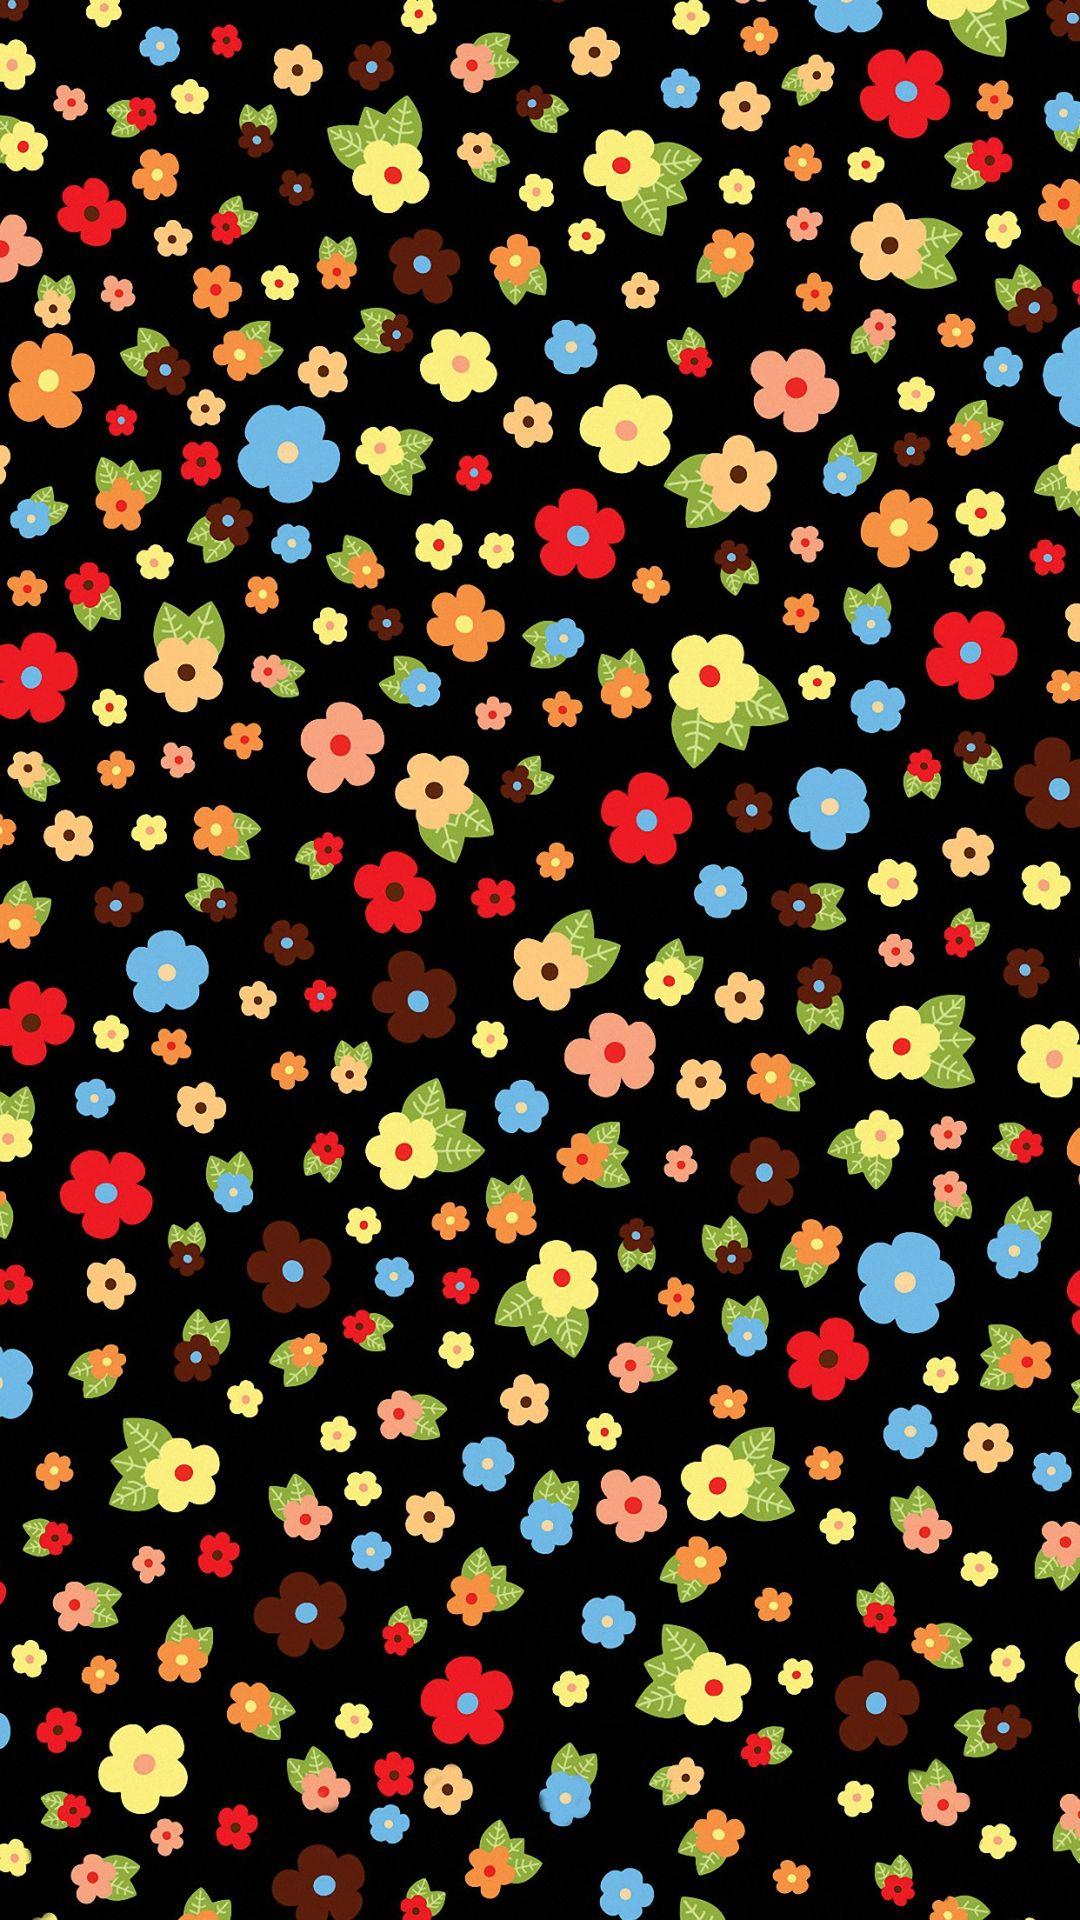 phone Wallpaper bile flowers wallpapers cell phone flowers